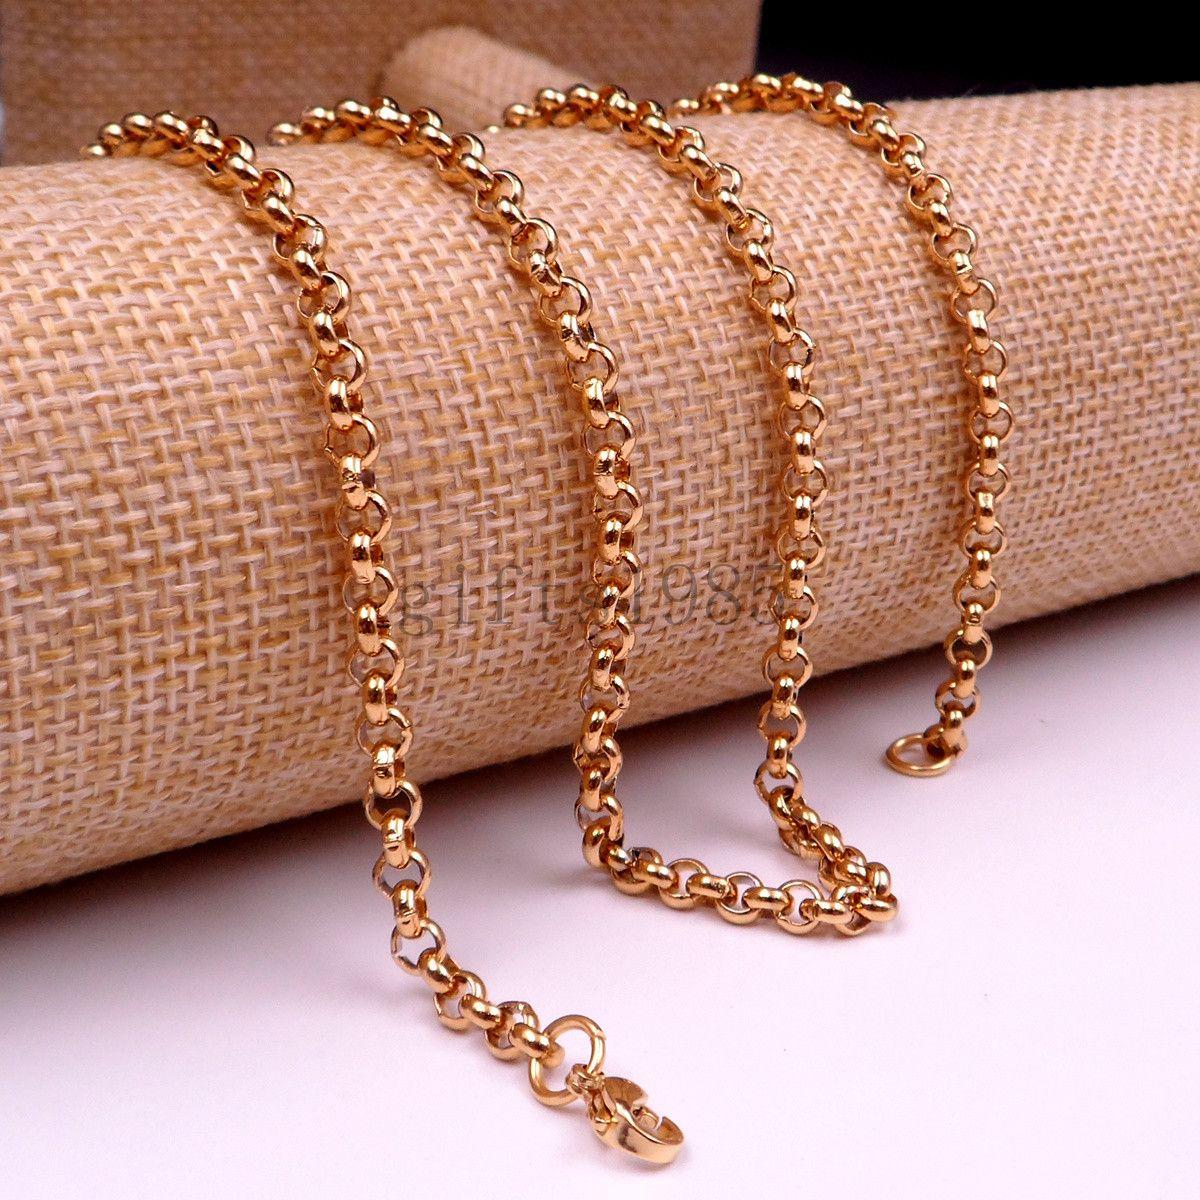 Vente chaude En Acier Inoxydable Or Rolo chaîne Collier 18-40inch bijoux chaîne charme